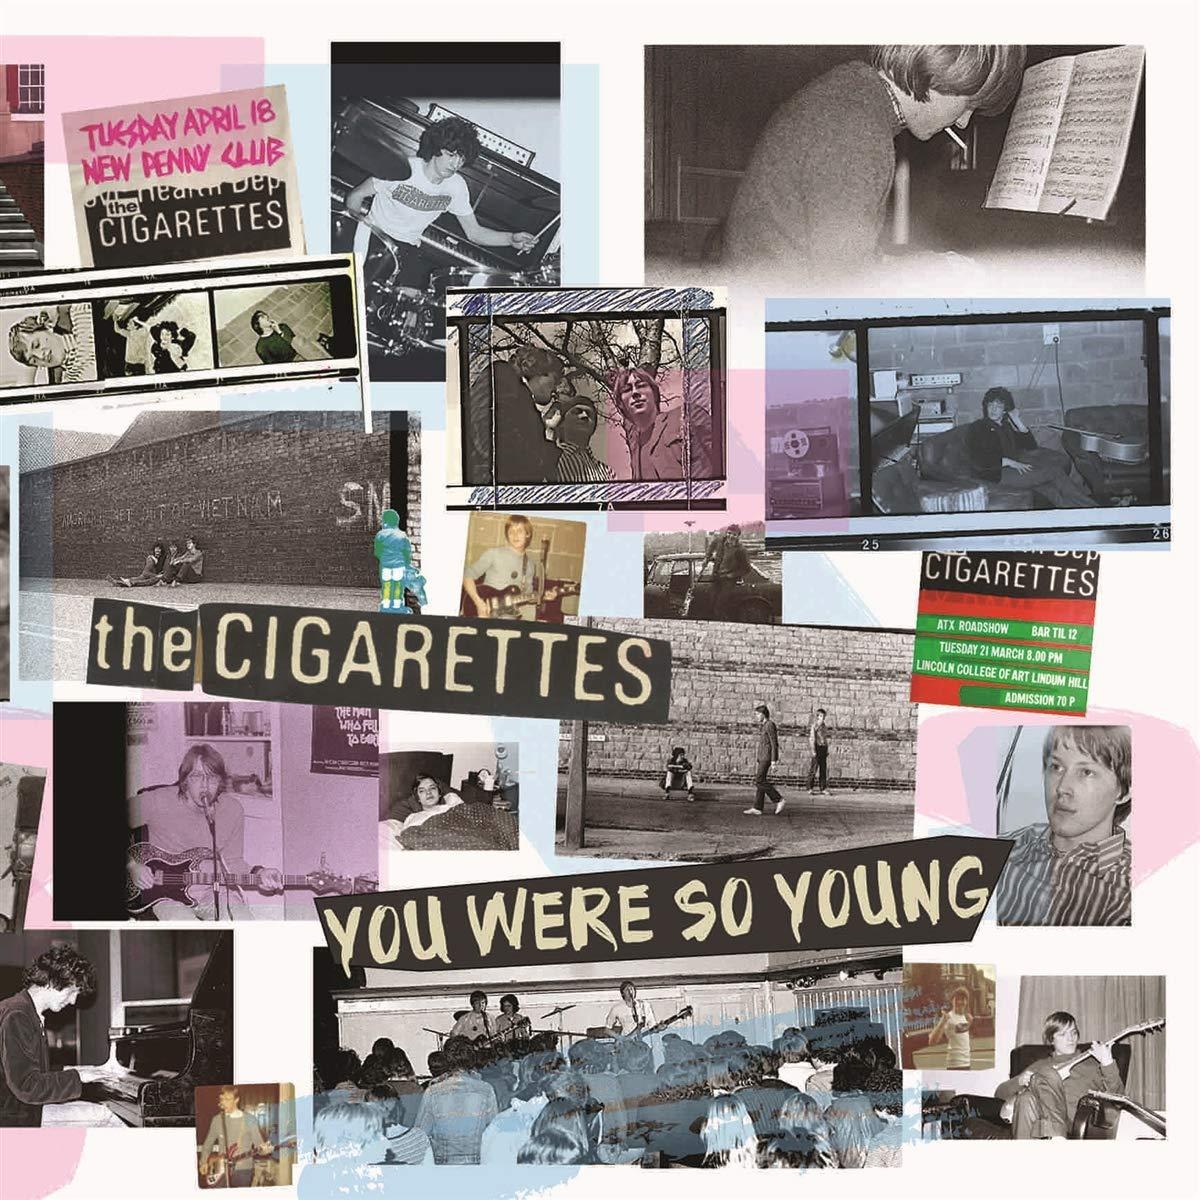 You Were So Young: Cigarettes,the: Amazon.es: Música